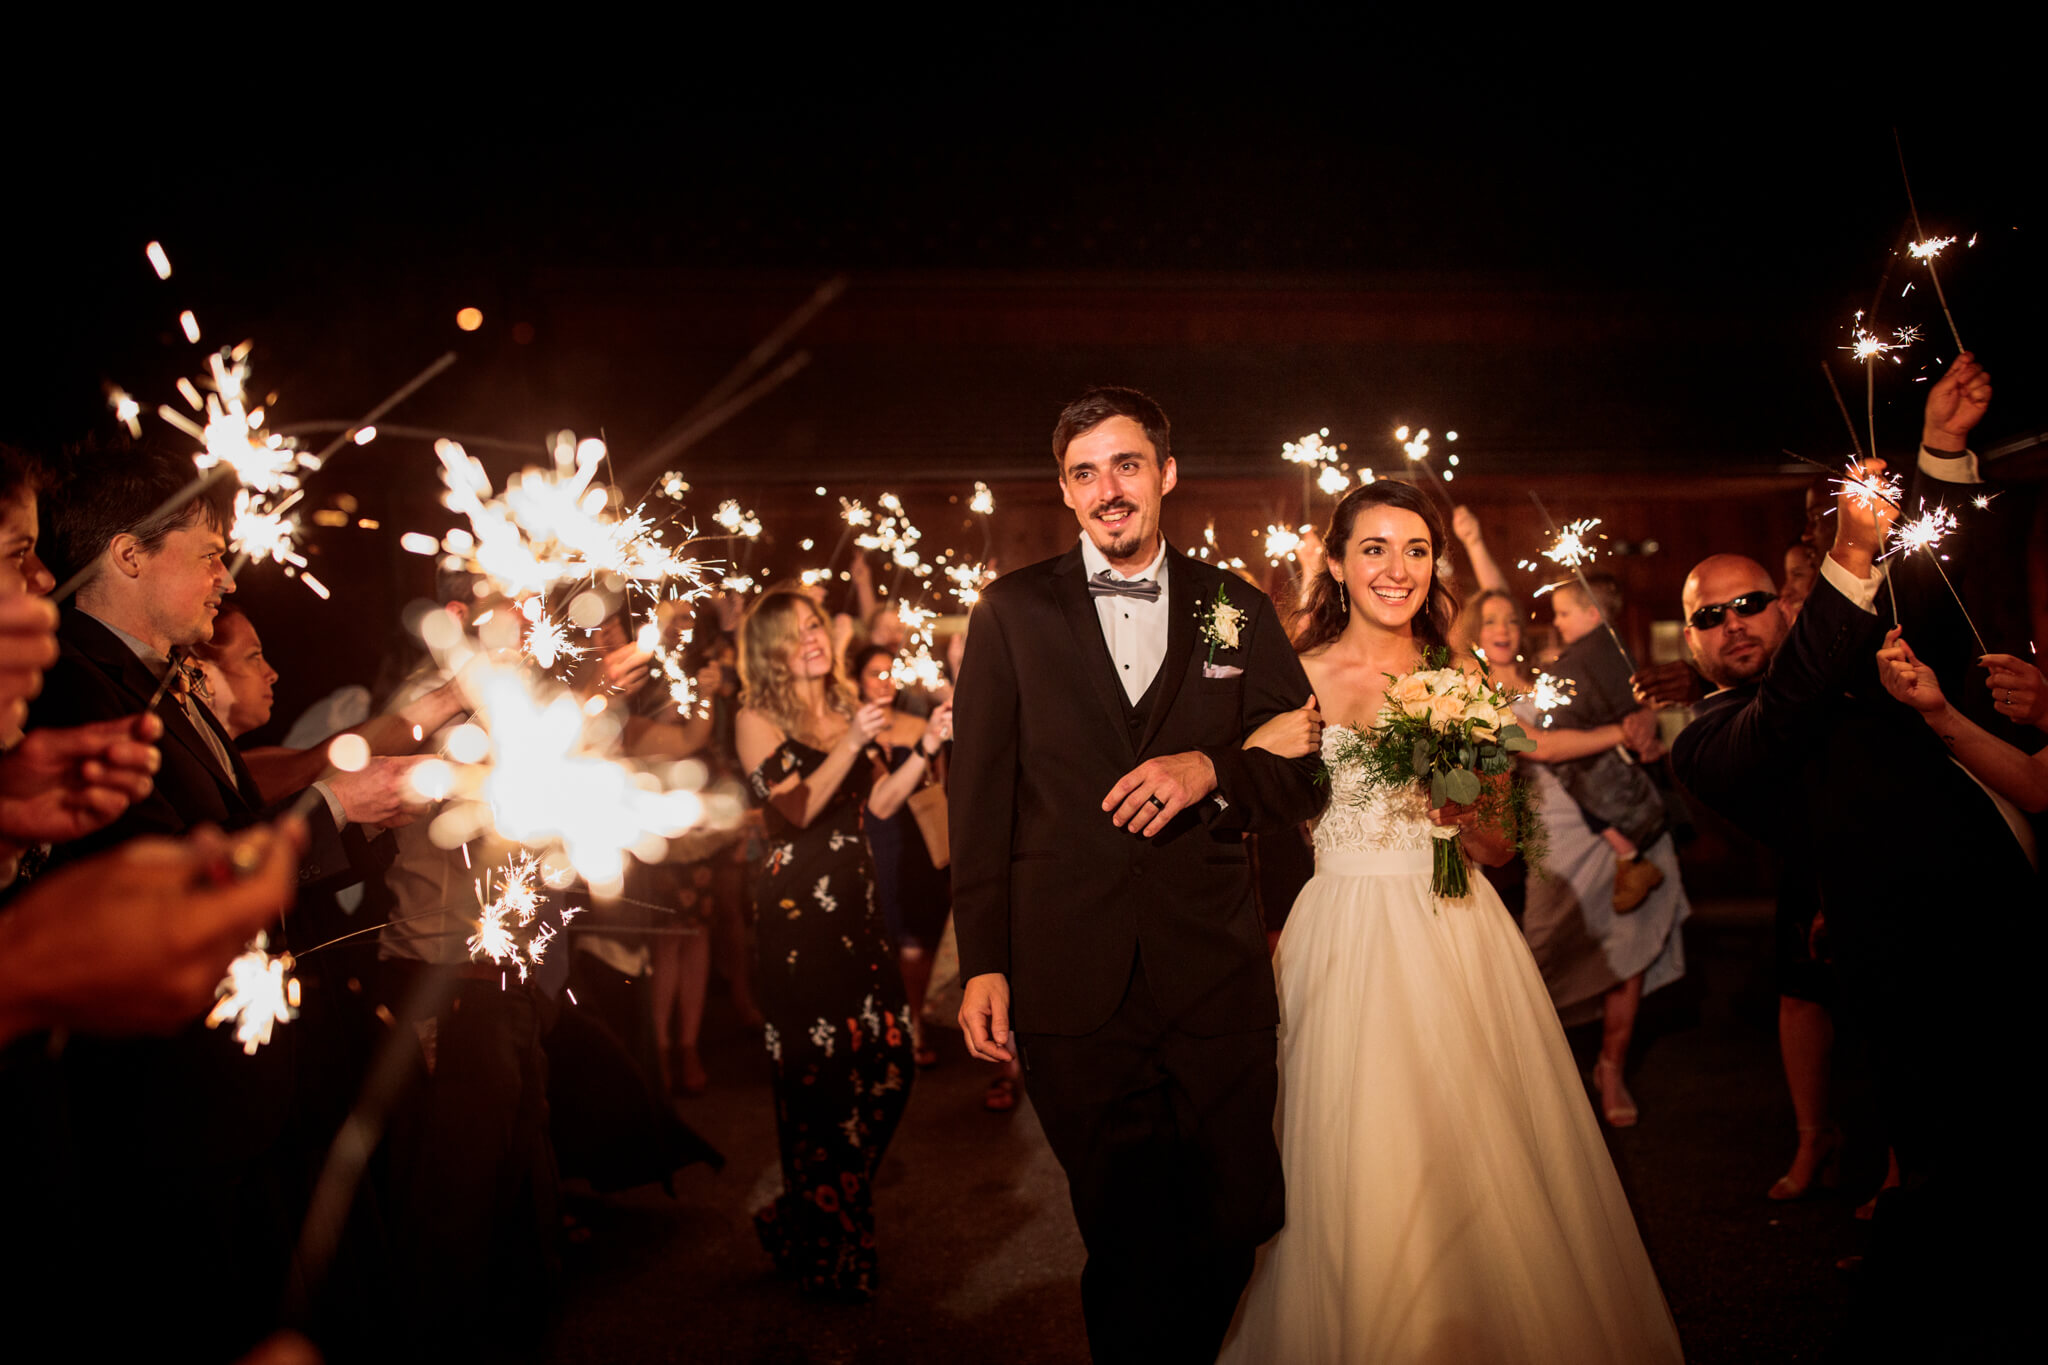 Alysia Jerad Homestead Blessings Farm Hershey PA Wedding Rustic Chique - 113.JPG